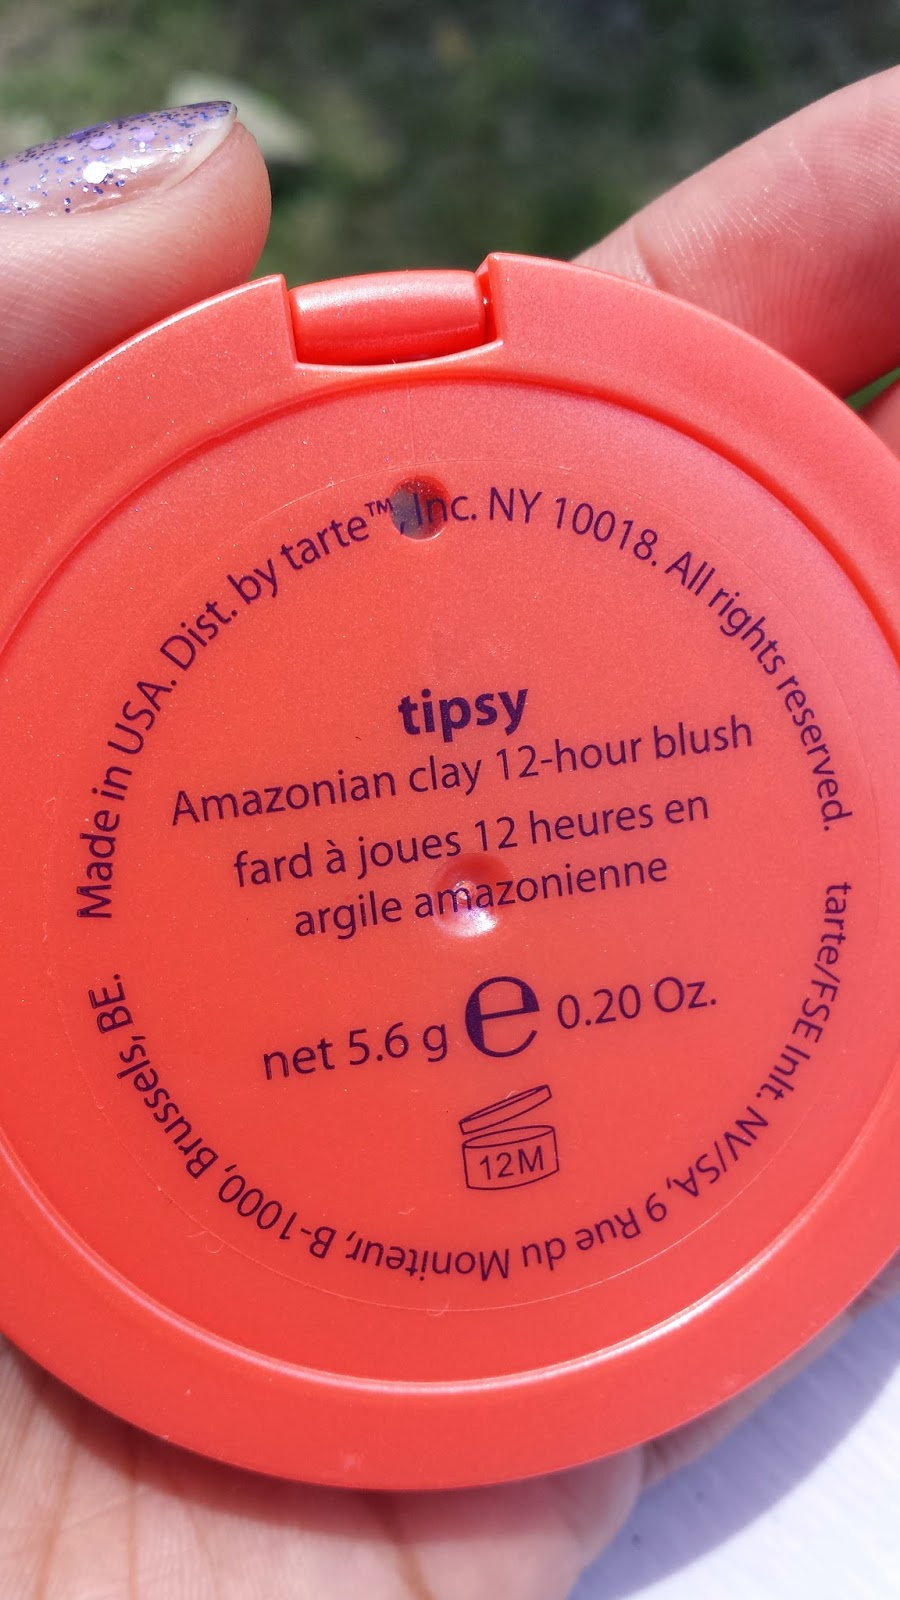 Tarte Amazonian Clay blush 'Tipsy' - www.modenmakeup.com